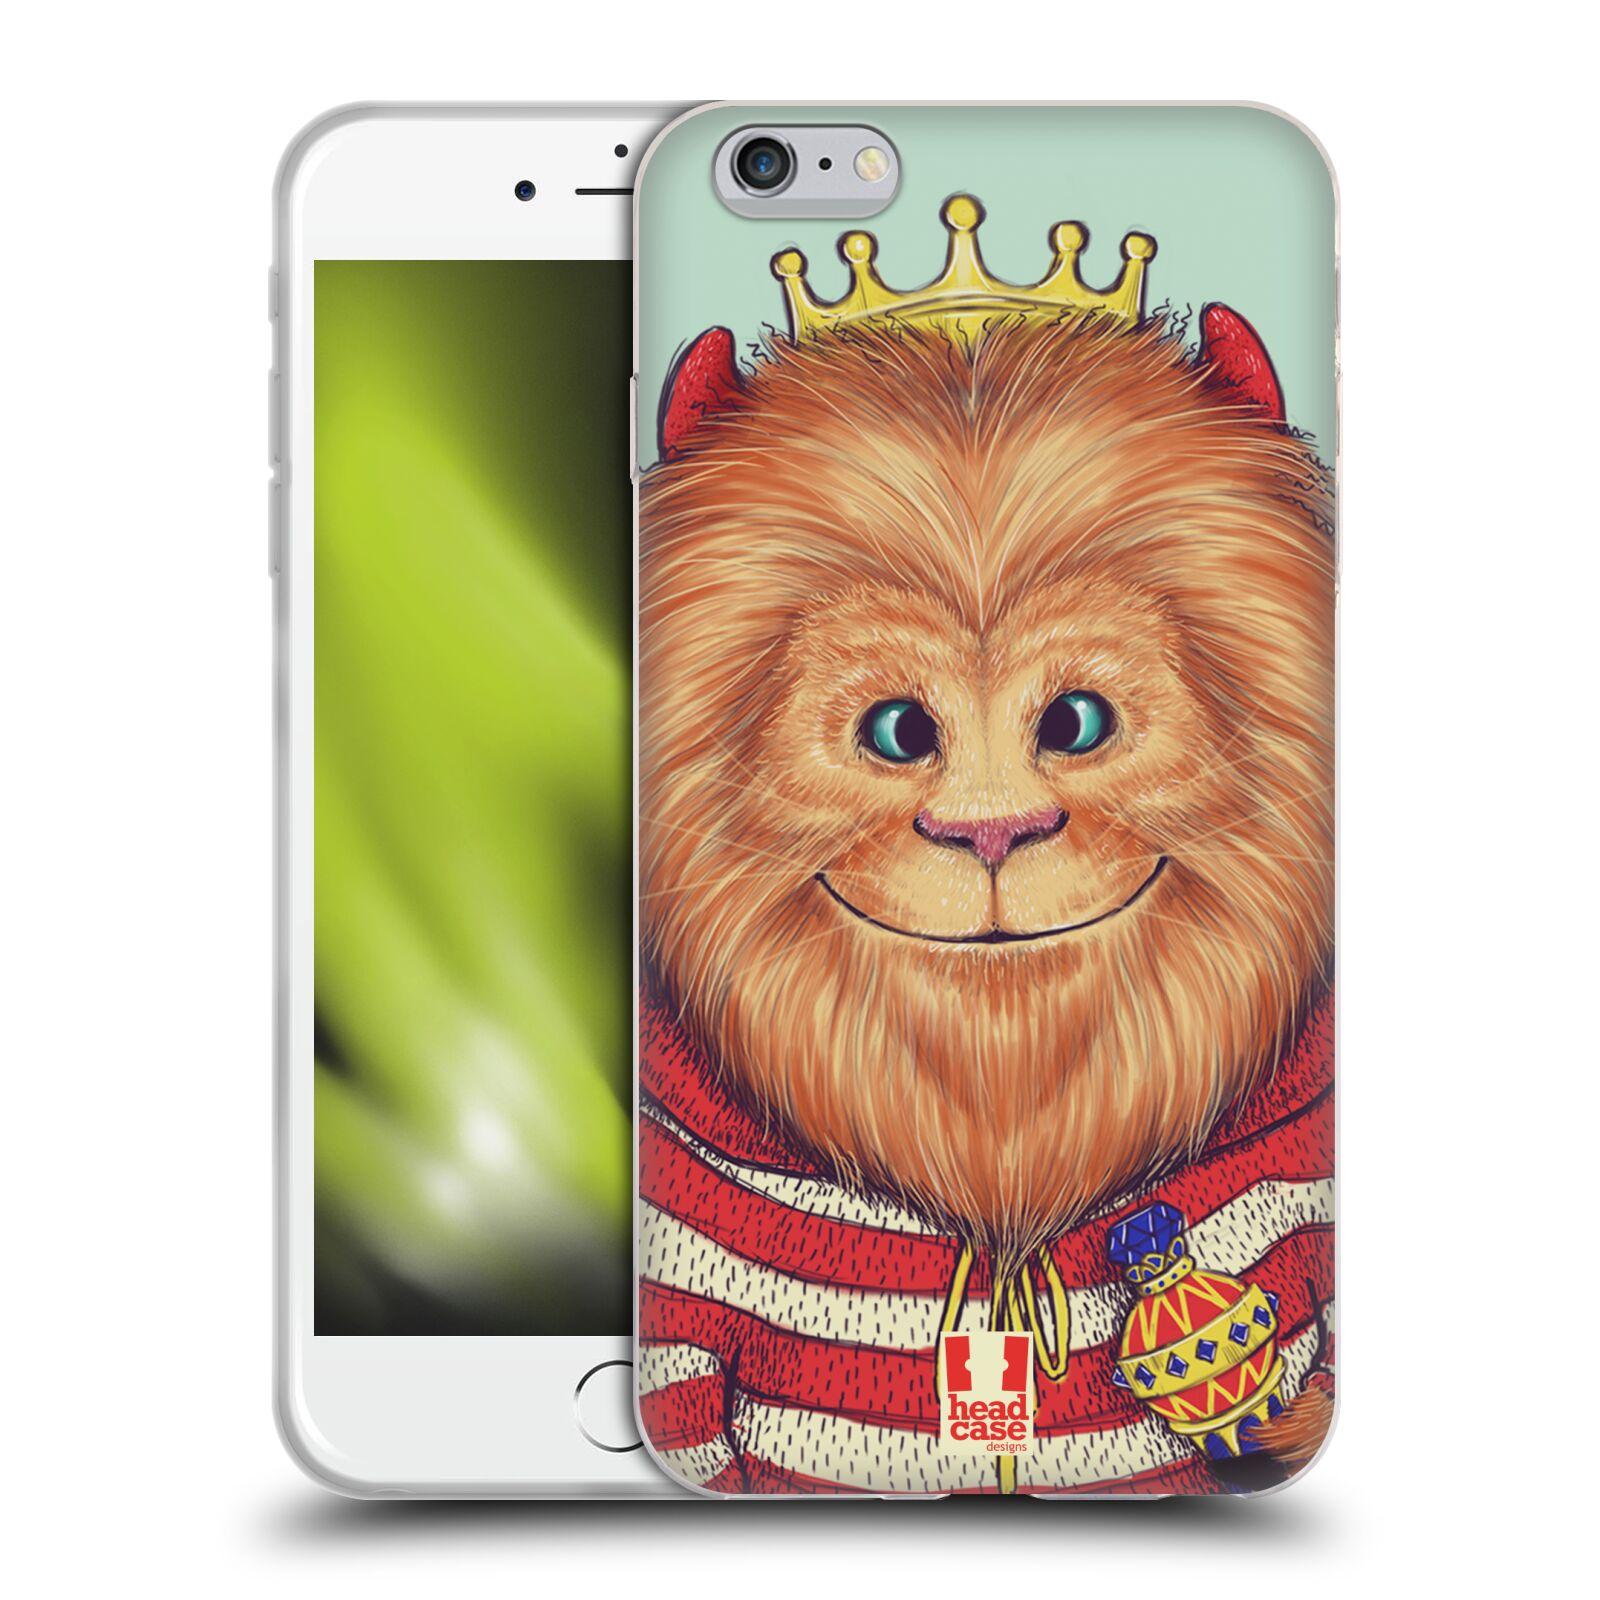 HEAD CASE silikonový obal na mobil Apple Iphone 6 PLUS/ 6S PLUS vzor Kreslená zvířátka lev